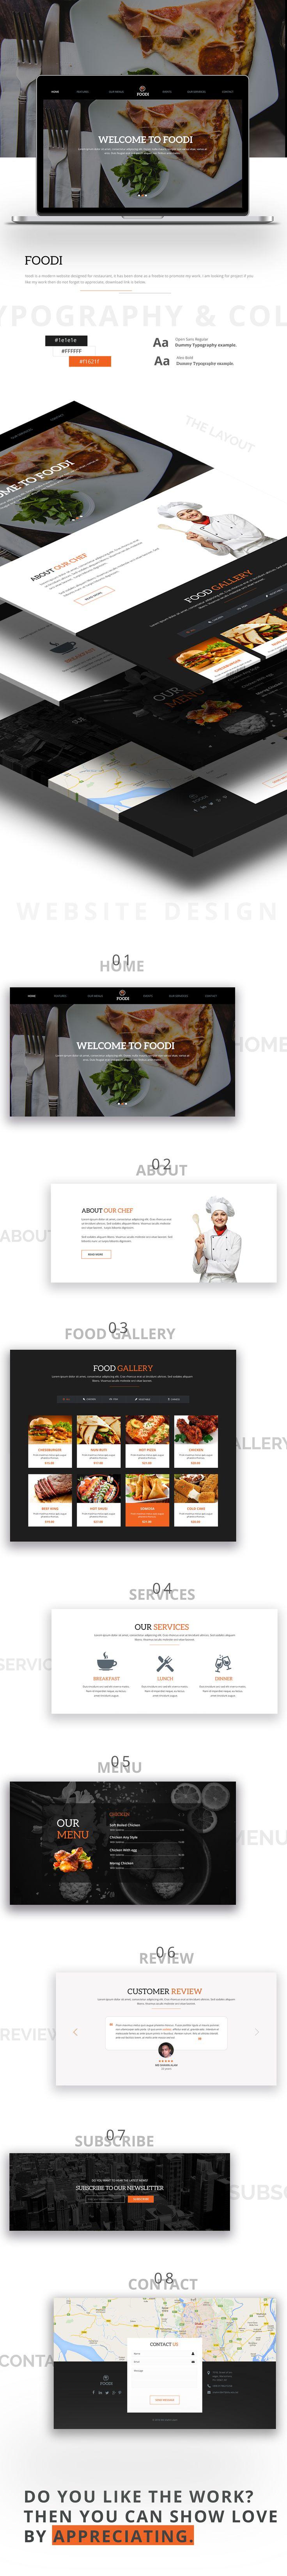 Restaurant Website Homepage Template Free PSD | uihive